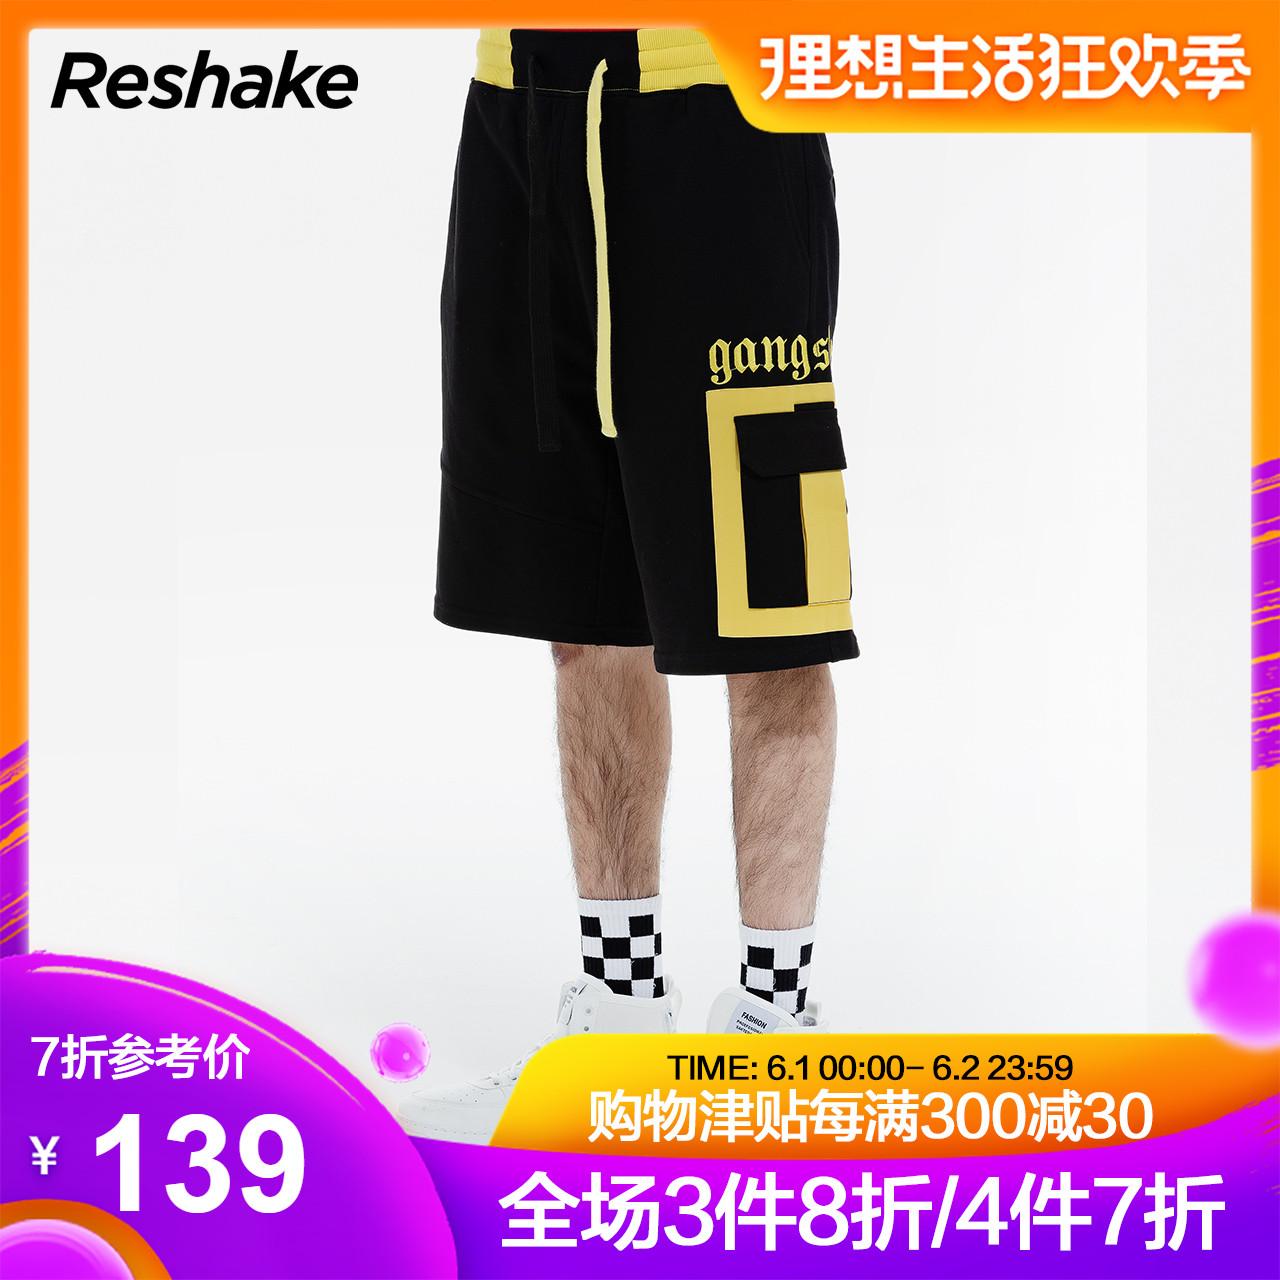 RESHAKE华菲型格2019夏新品休闲运动针织五分短裤薄款夏装潮牌